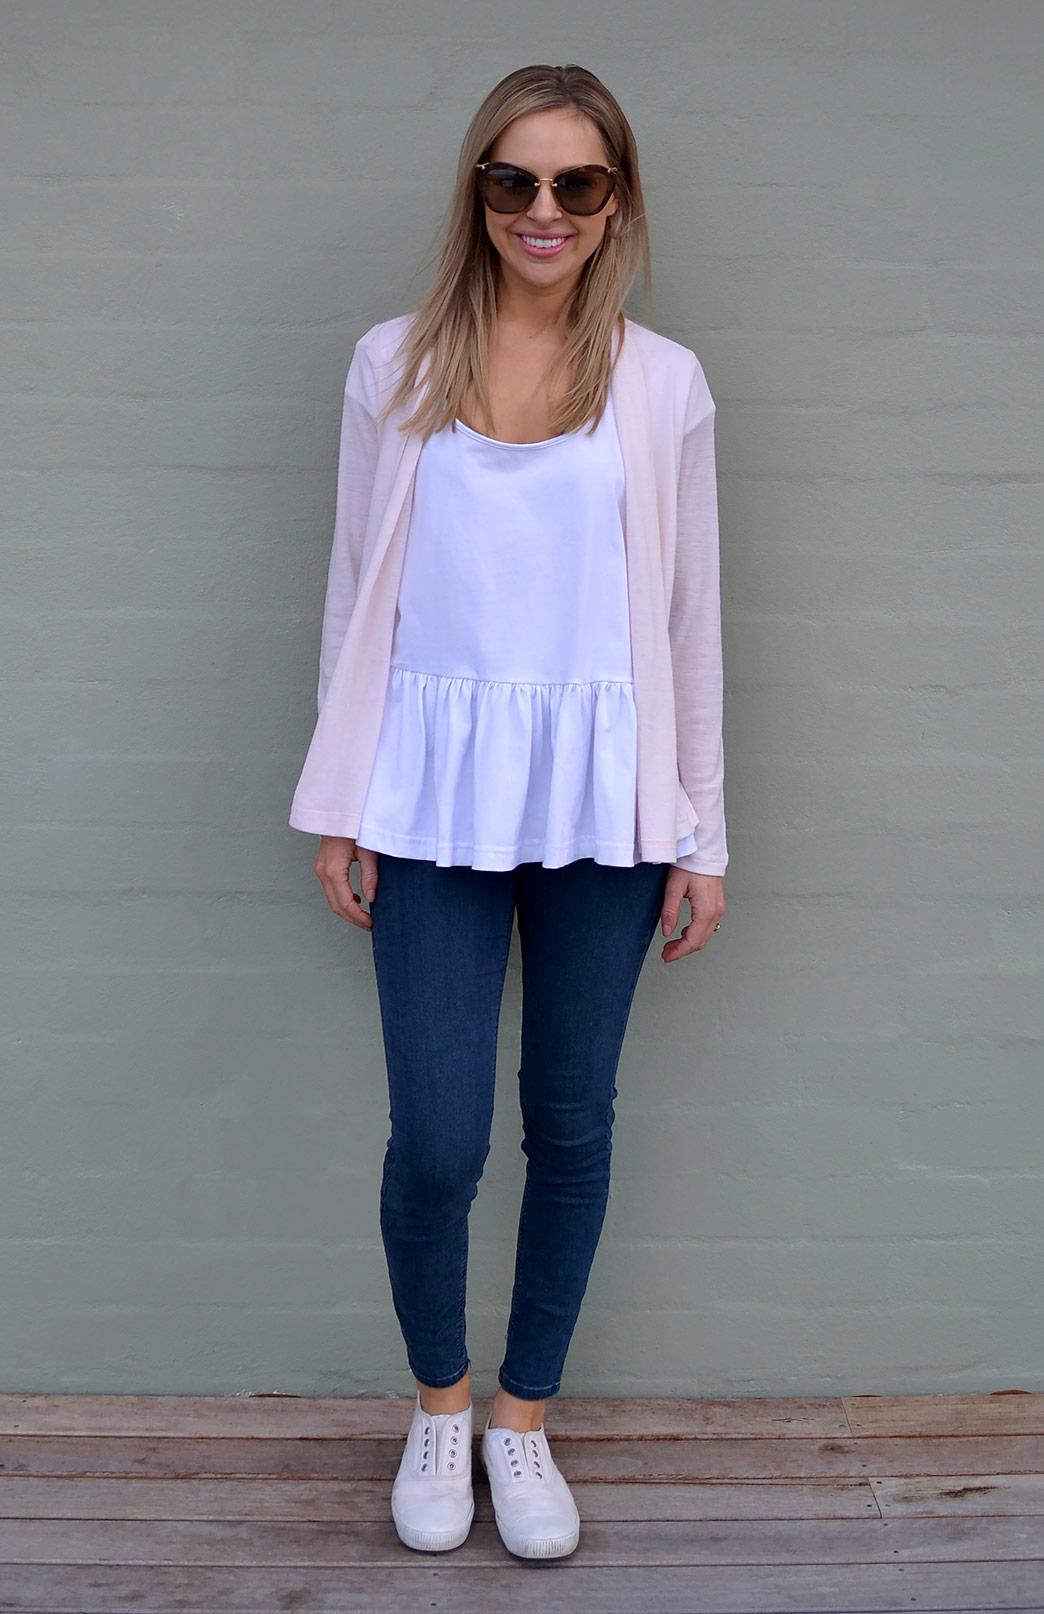 Mini Drape Cardigan - Women's Soft Pale Pink Long Sleeve Merino Wool Cardigan - Smitten Merino Tasmania Australia